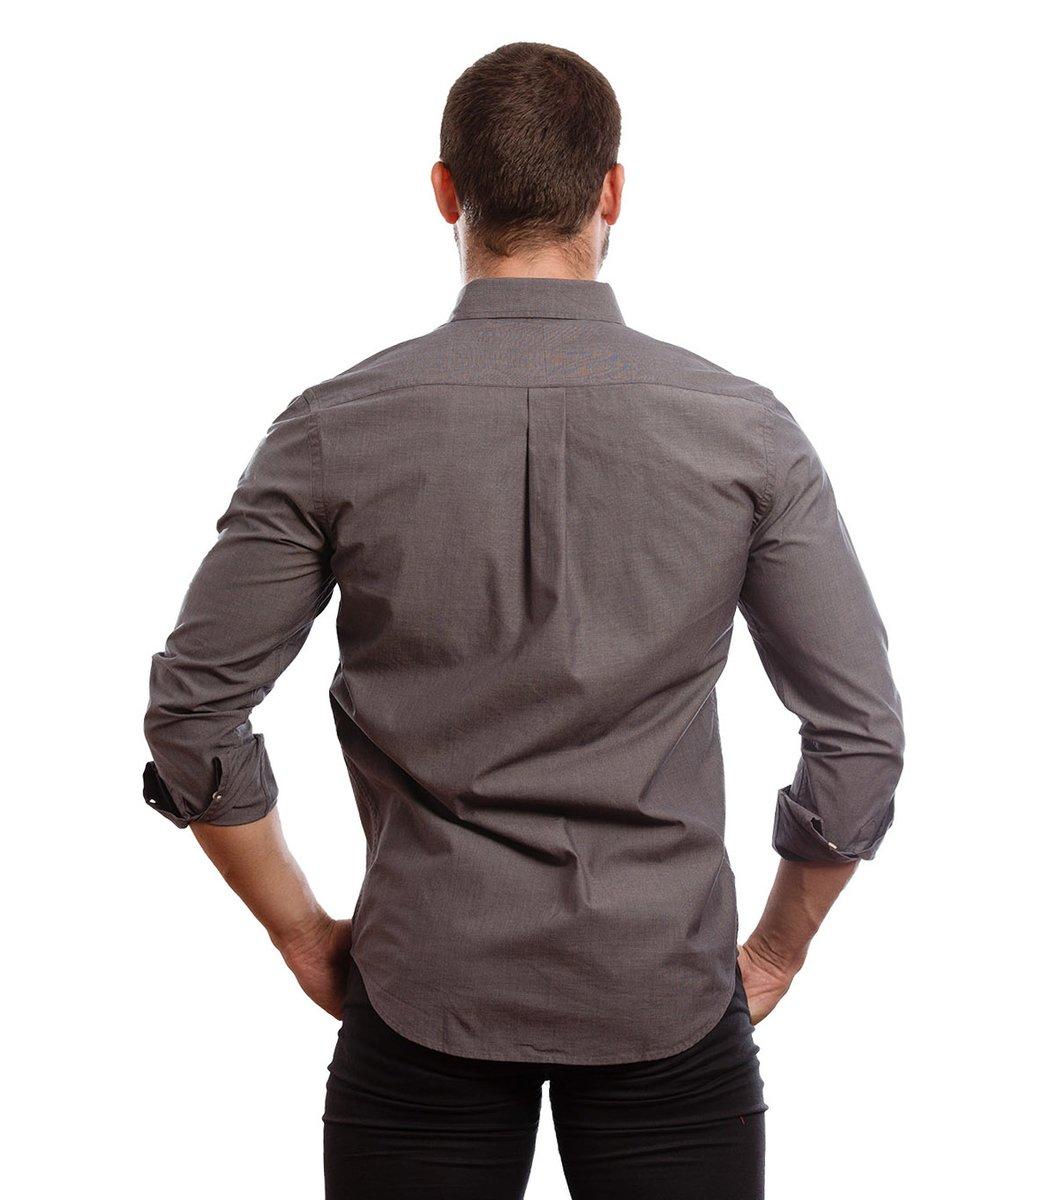 Рубашка POLO Ralph Lauren RR1 (Темно-серый) - Темно серый - Вид 6